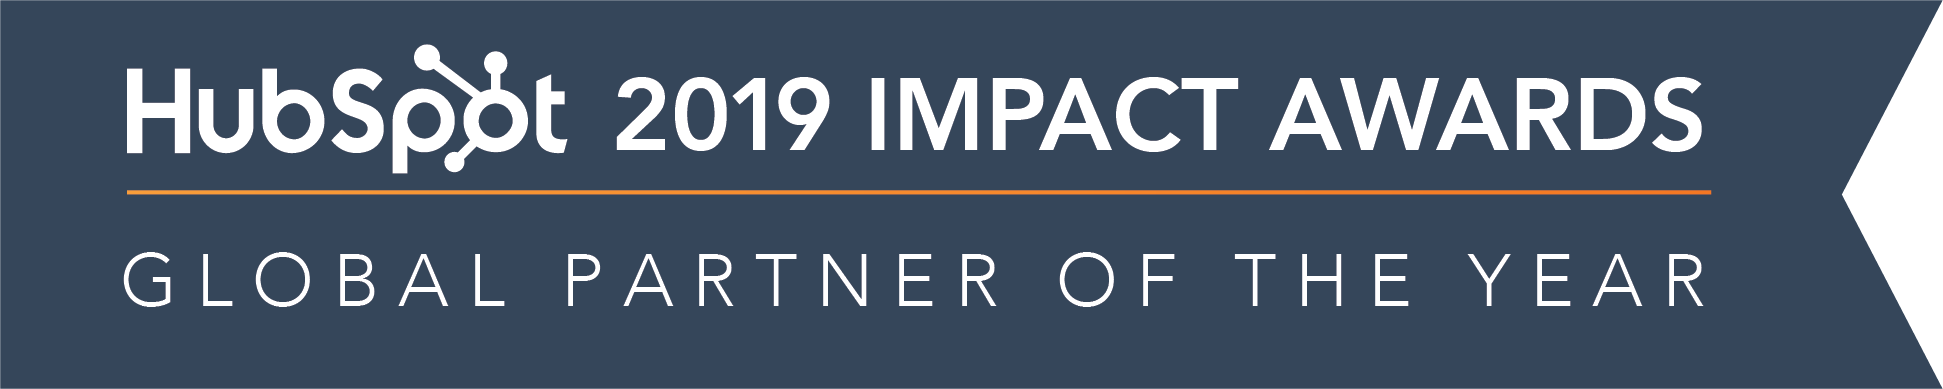 Hubspot_ImpactAwards_2019_GlobalPartnerOfTheYear-02